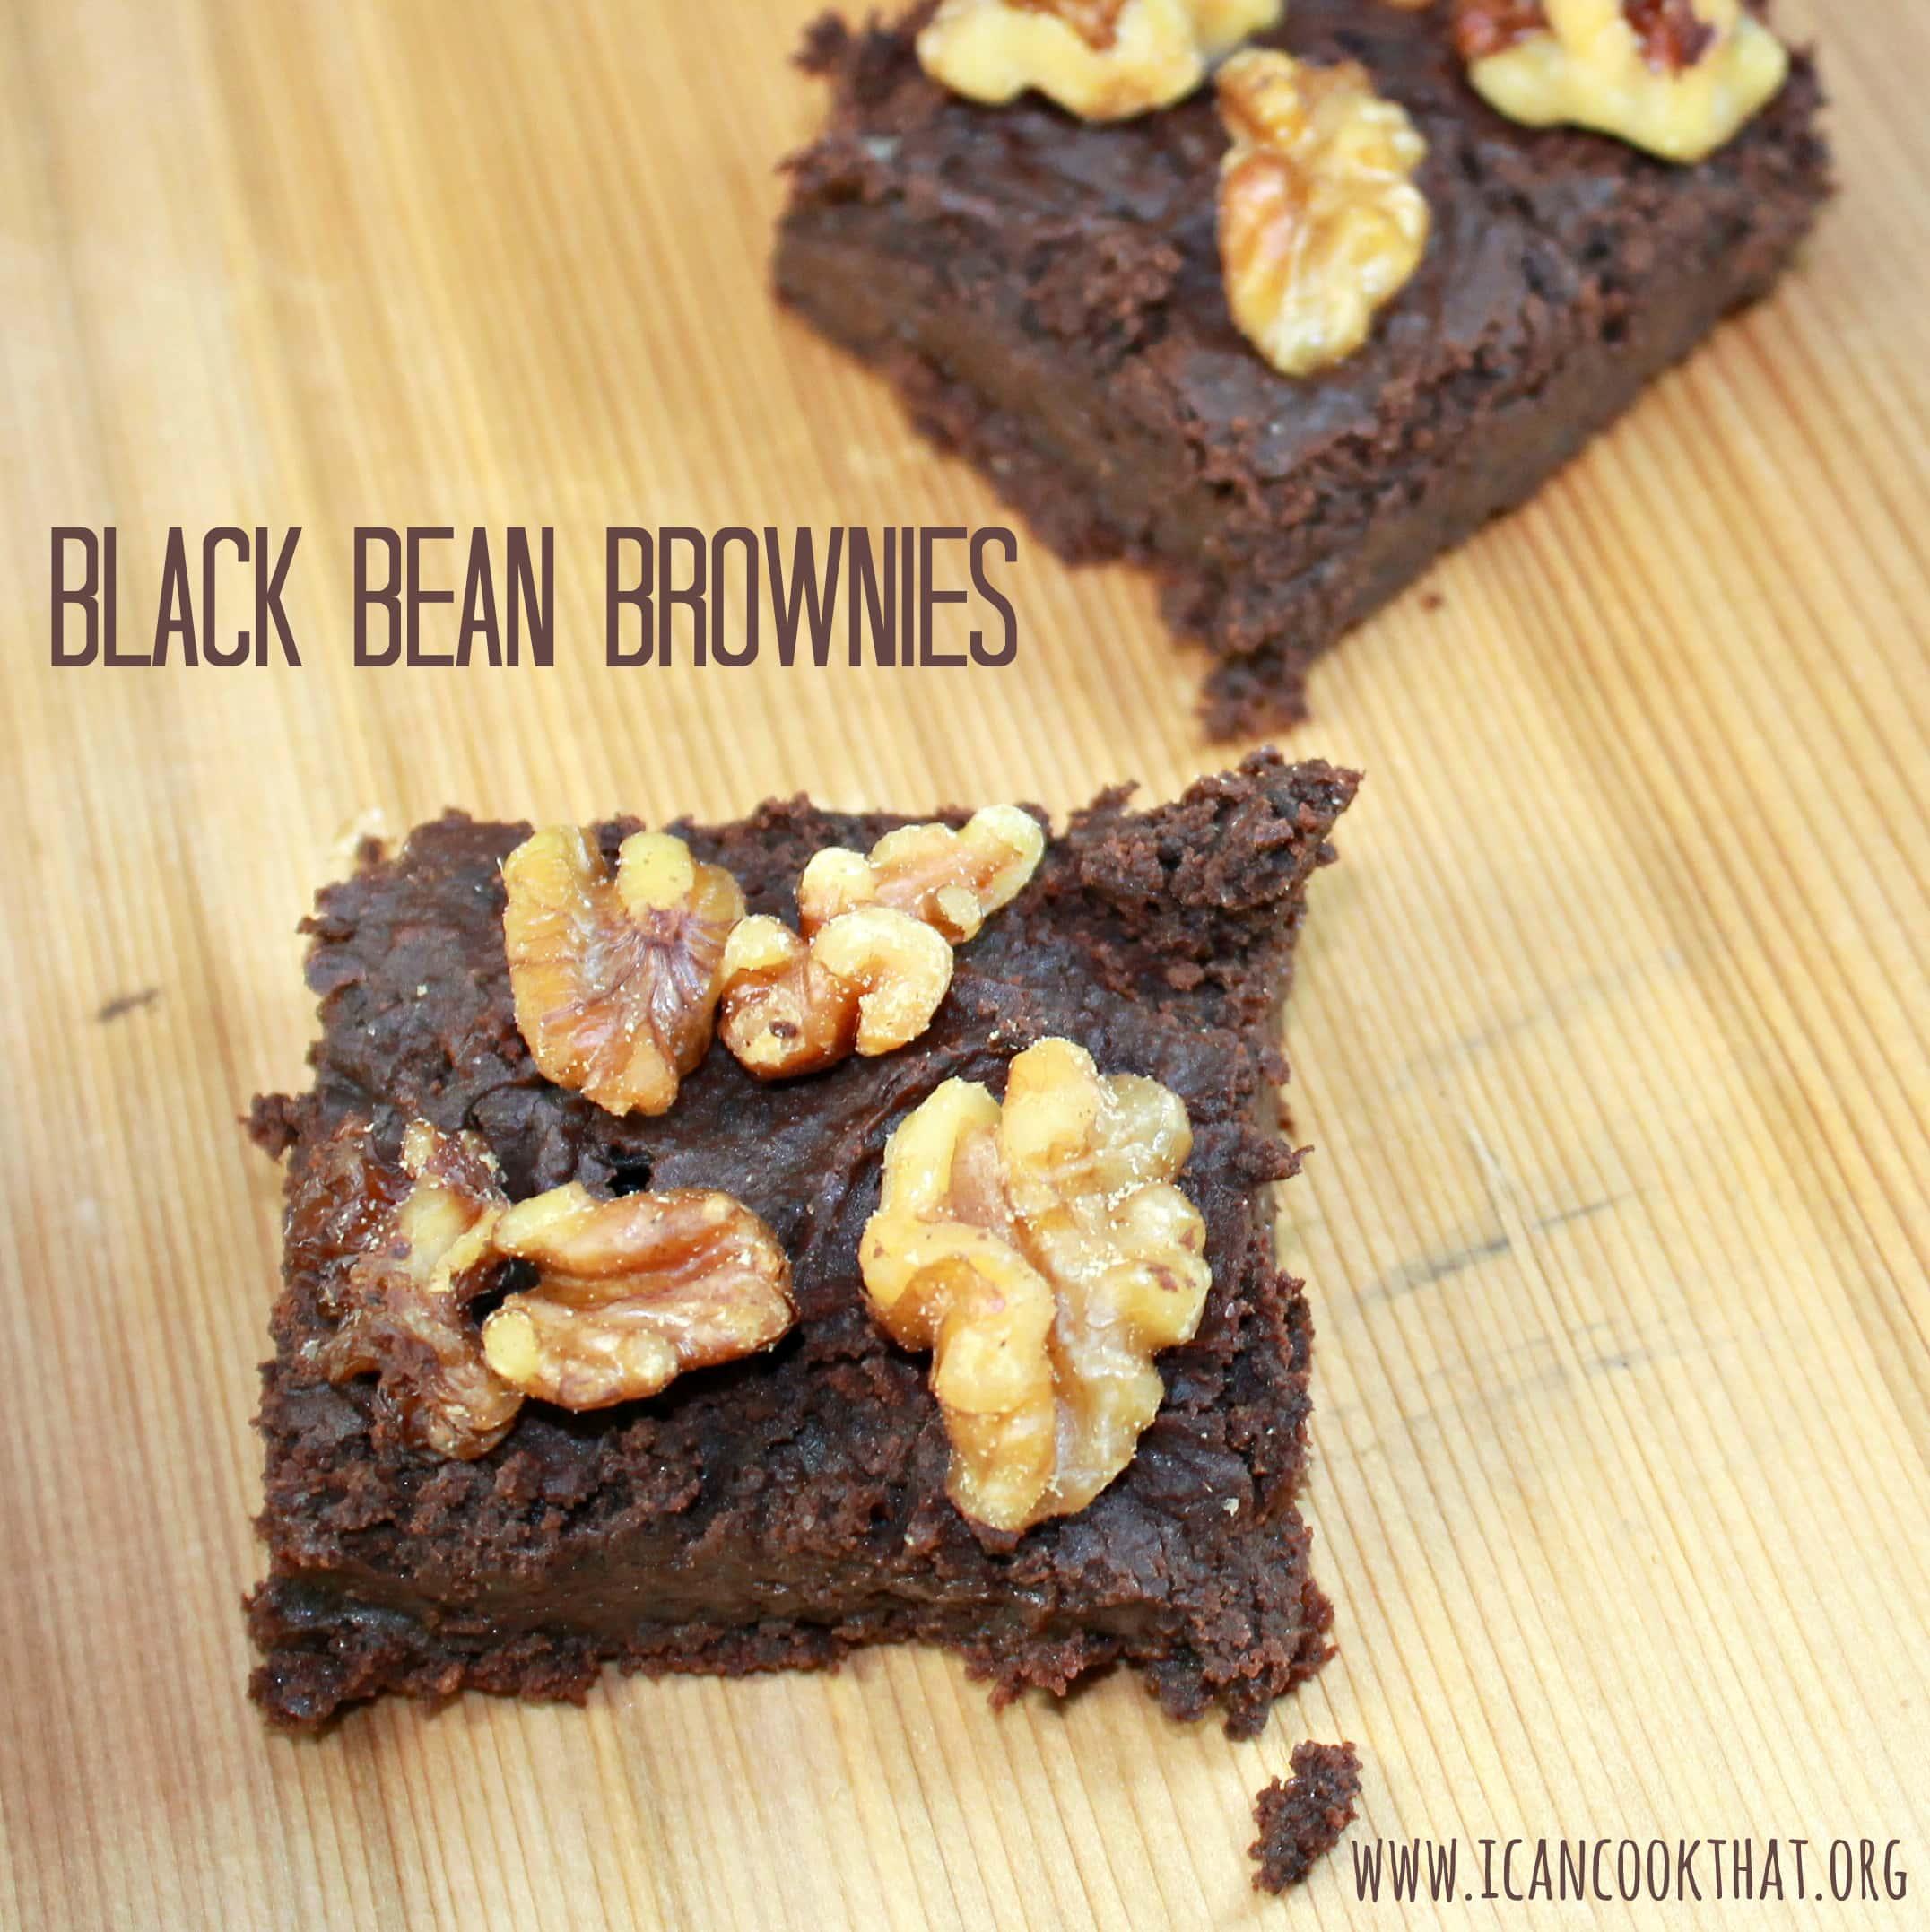 Gluten Free Vegan Black Bean Brownies Recipe | I Can Cook That